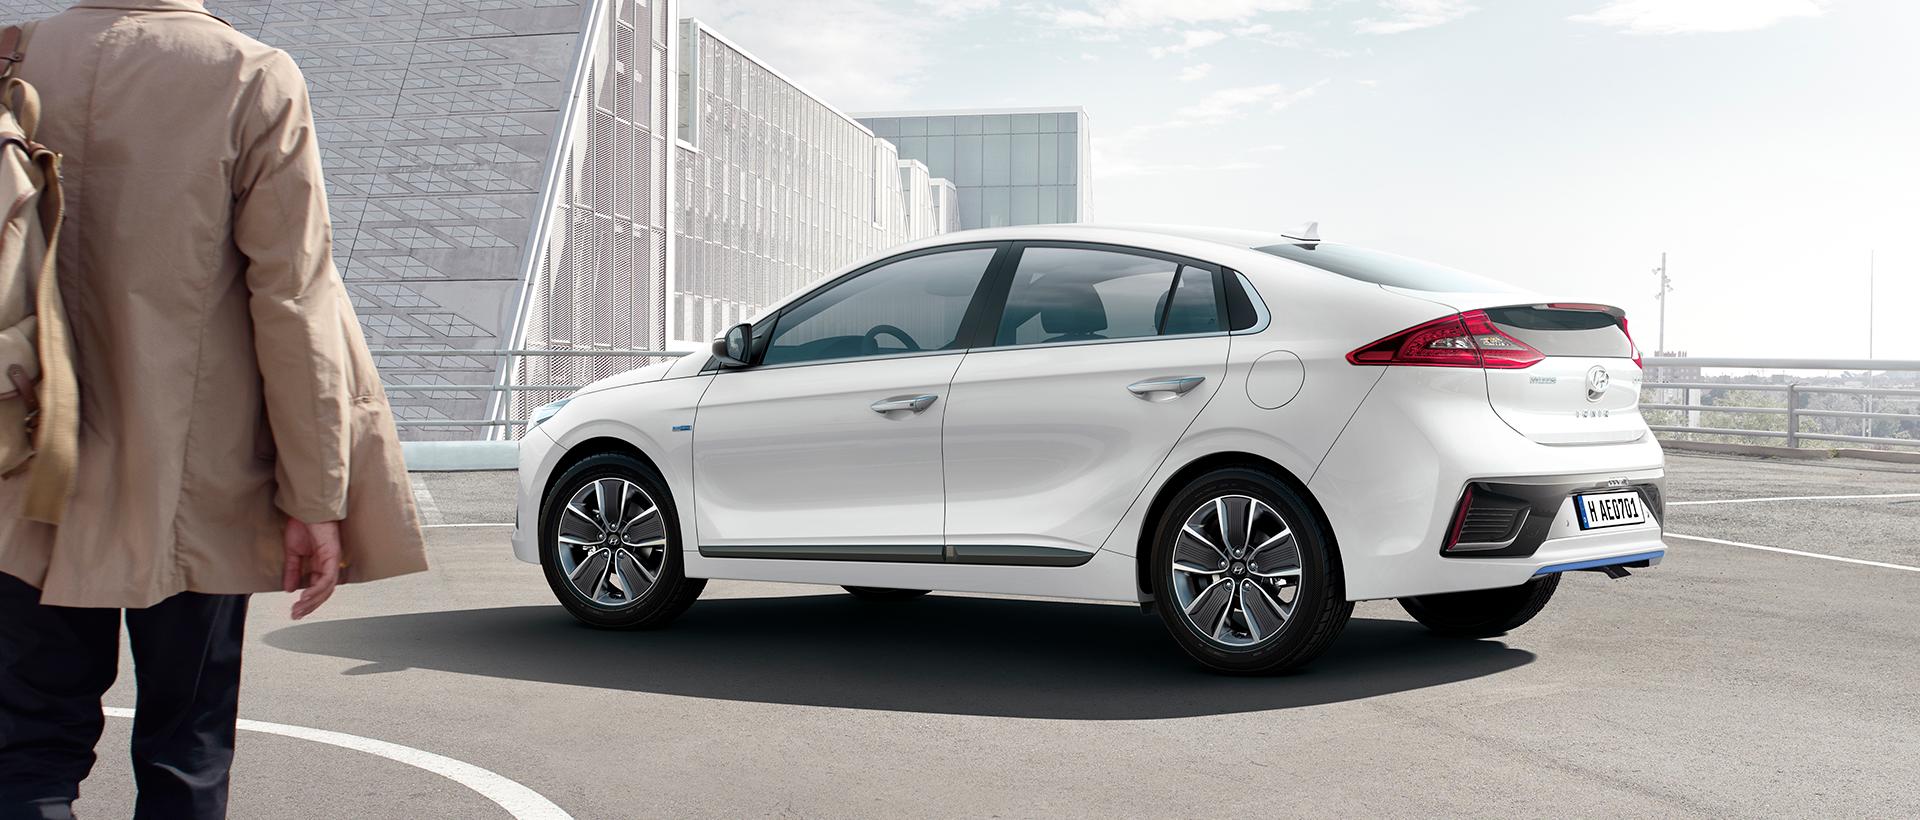 Hyundai IONIQ hybrid udenfor